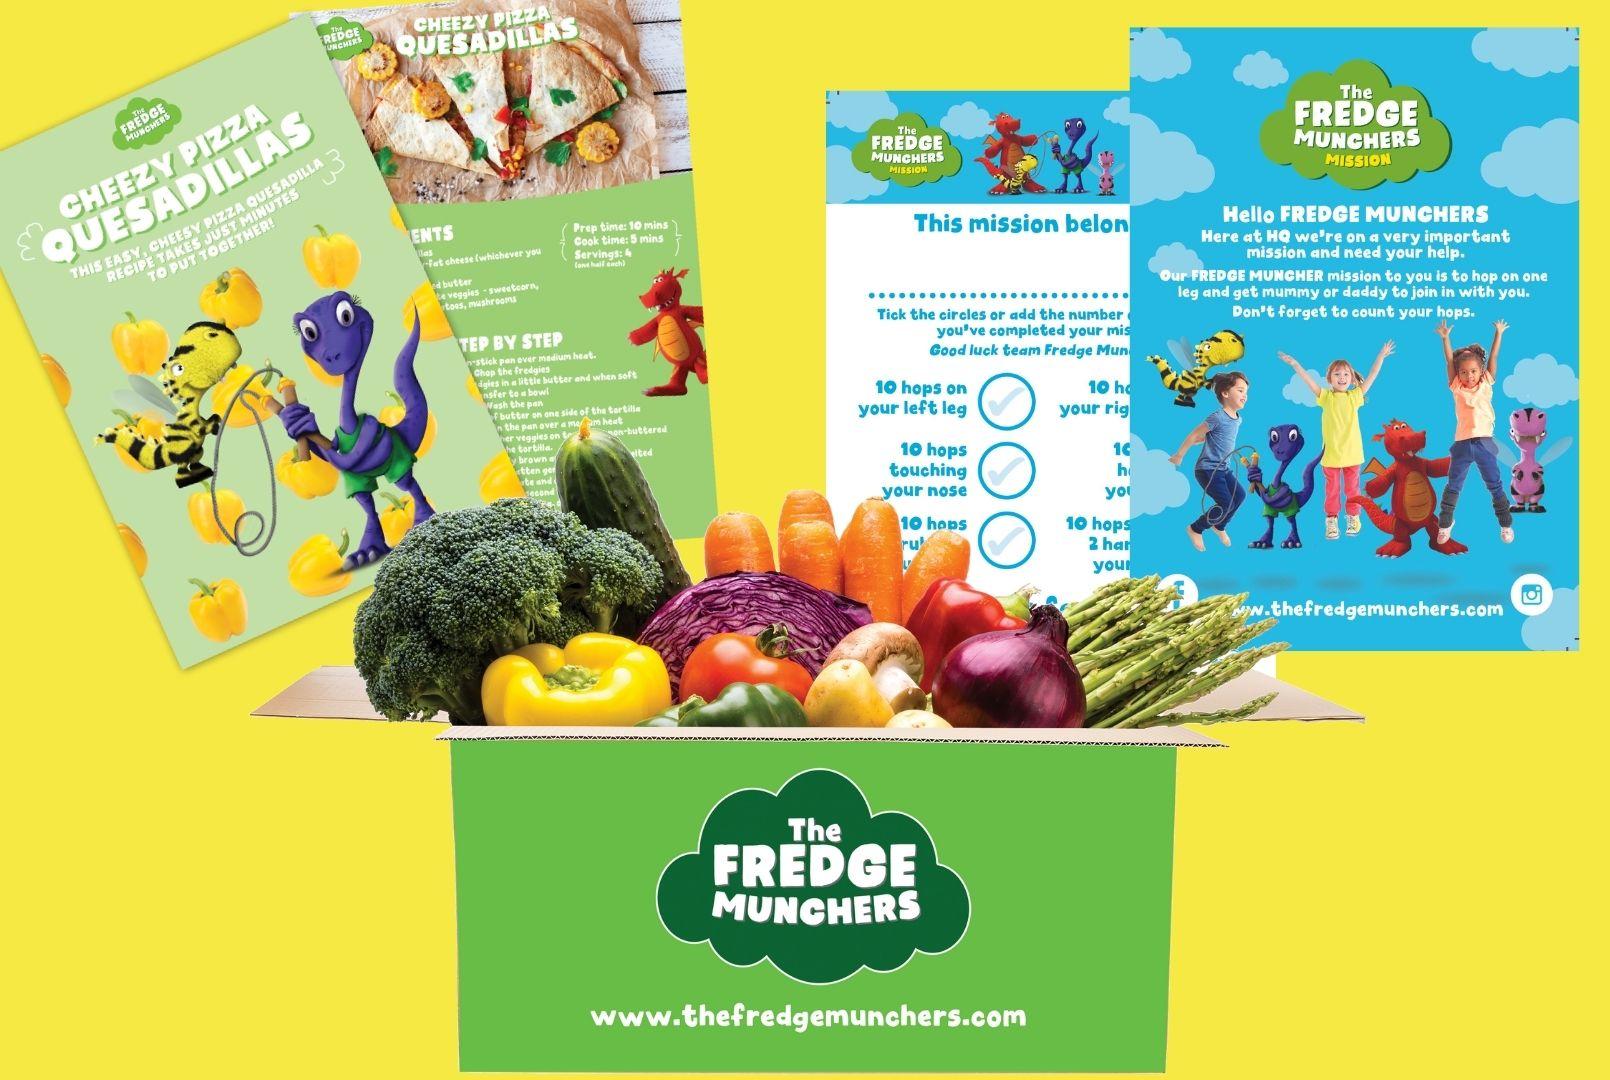 Fredge Munchers subscription boxes